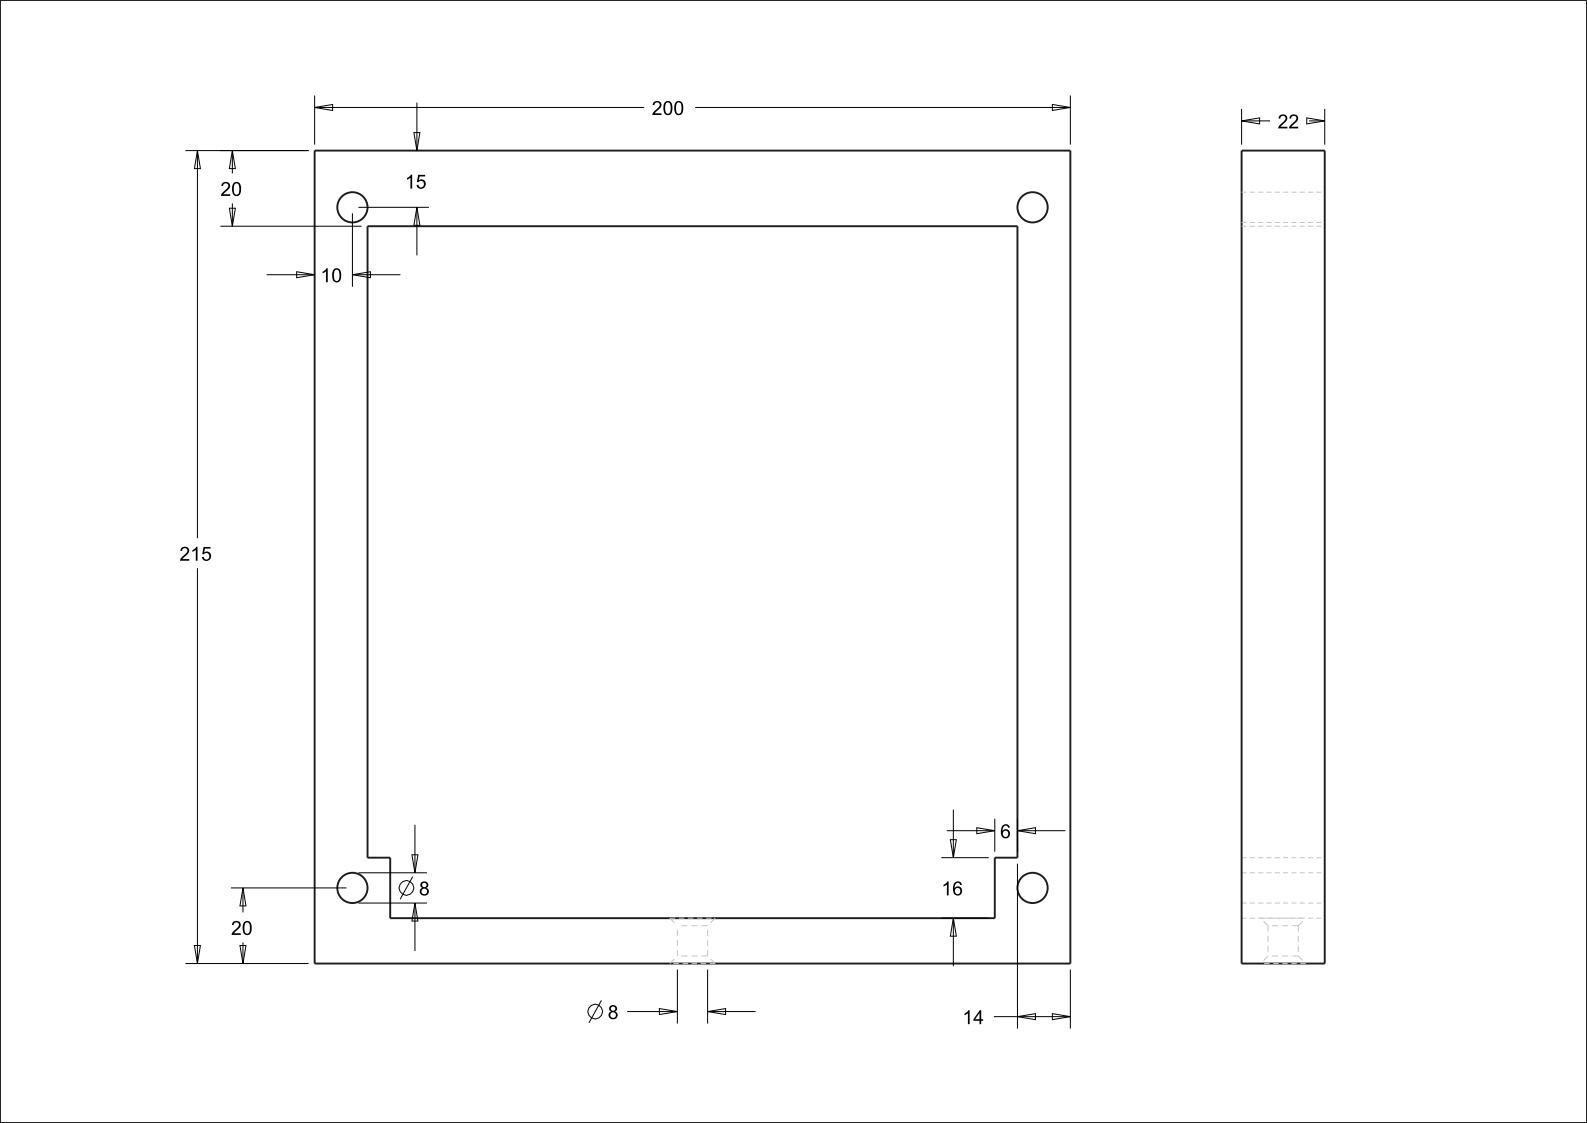 Schön 22 X 16 Rahmen Bilder - Bilderrahmen Ideen - szurop.info